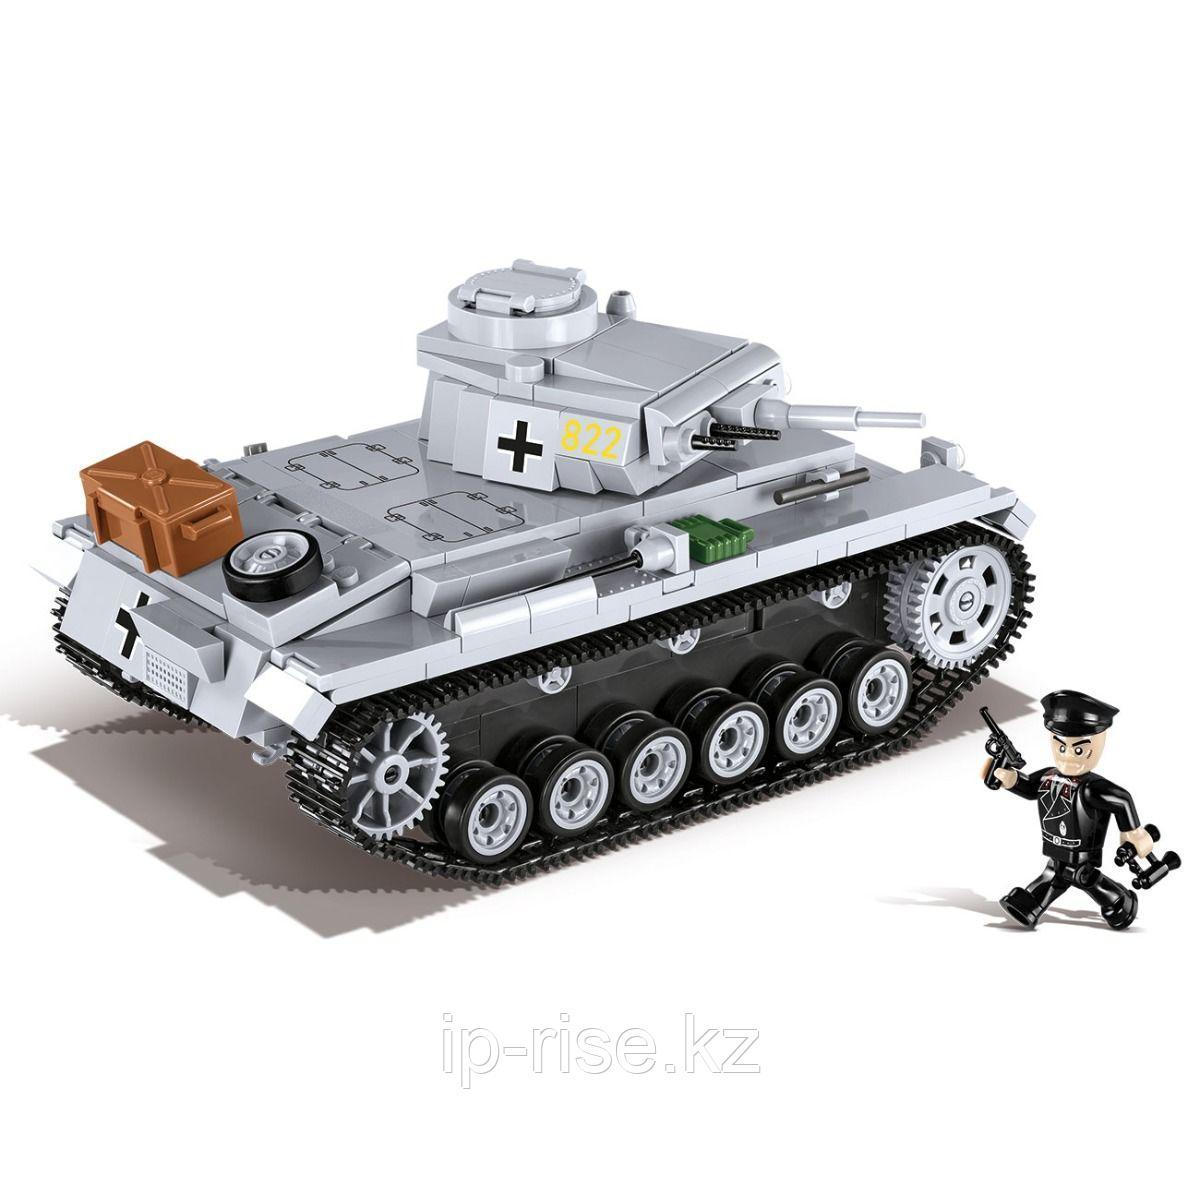 COBI: Средний танк PZKPFW III AUSF.E, 470 дет.